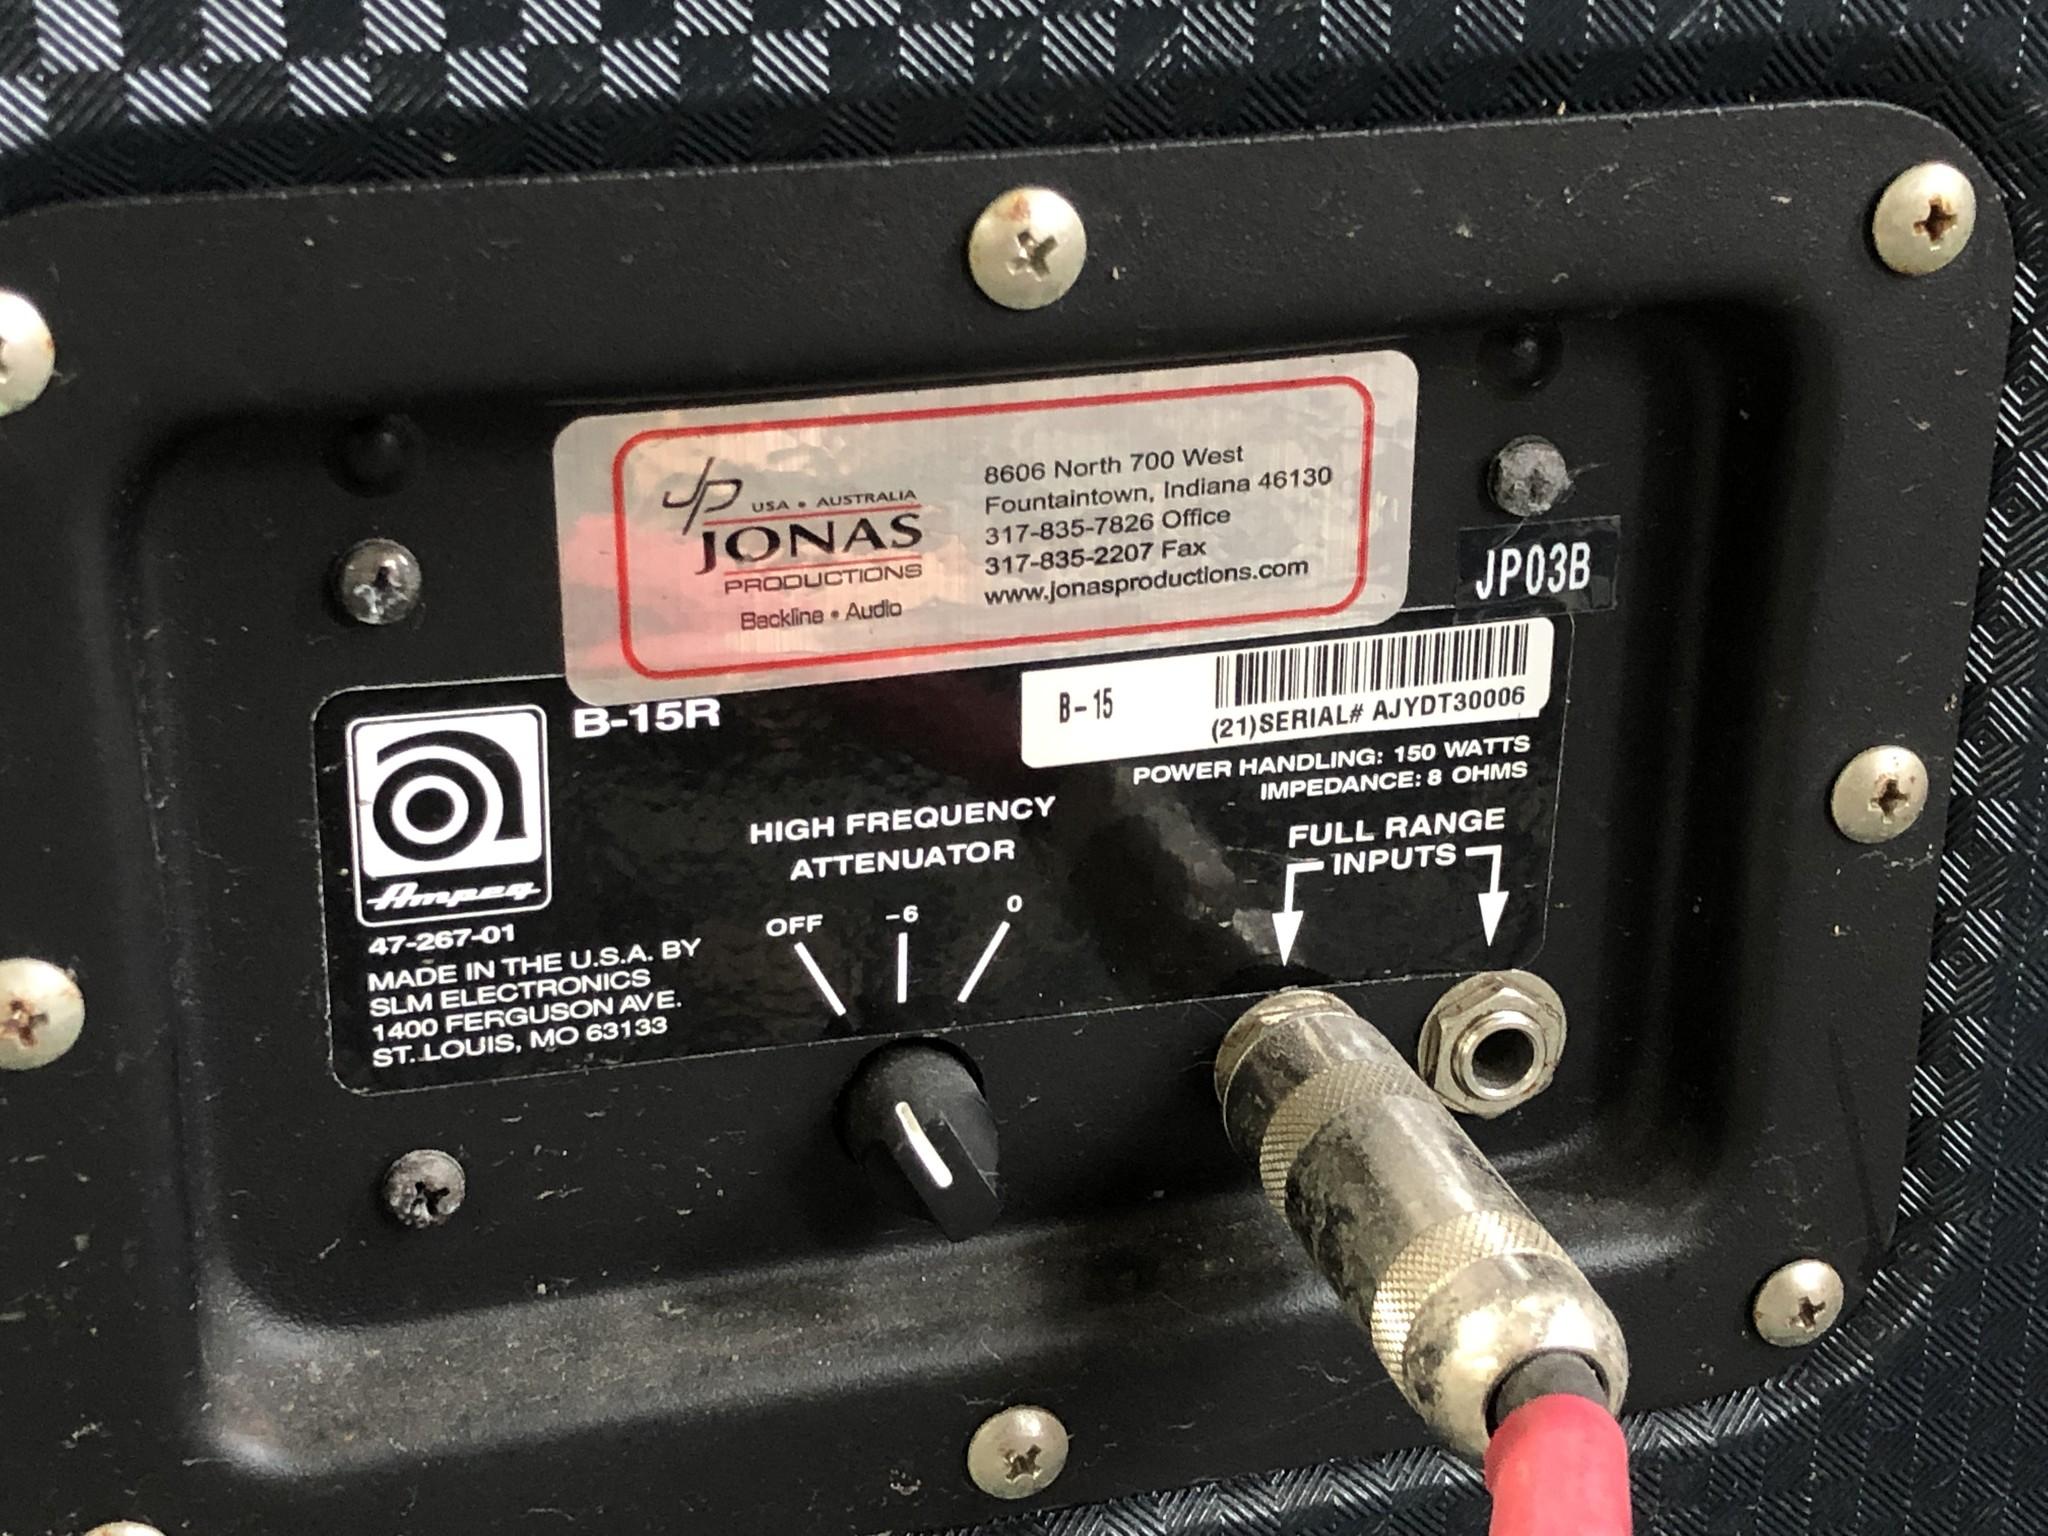 Ampeg B-15R Portaflex Amp and Cabinet-10